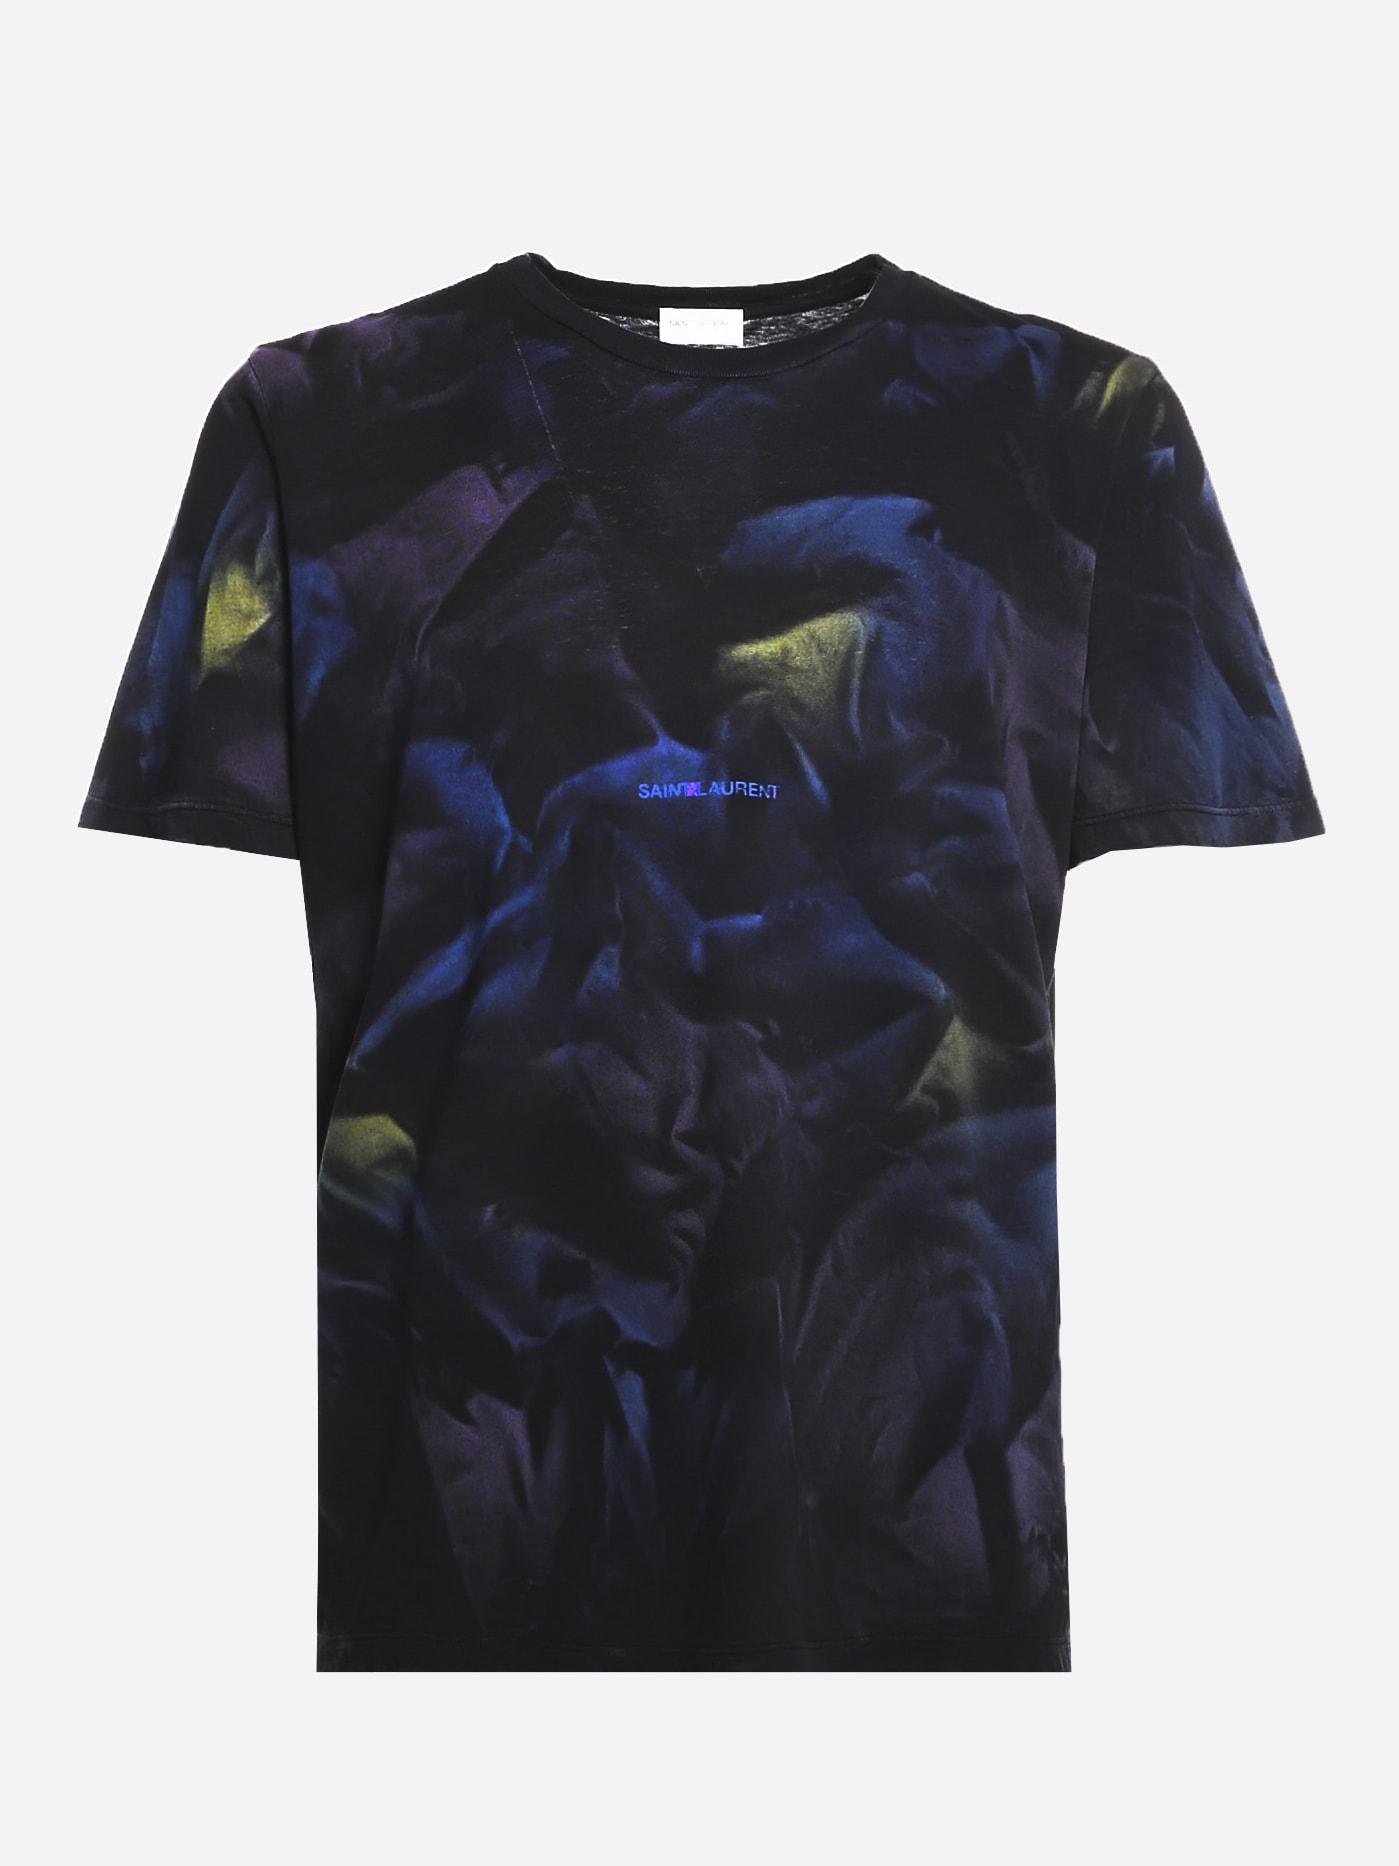 Saint Laurent Cotton T-shirt With All-over Tie-dye Print